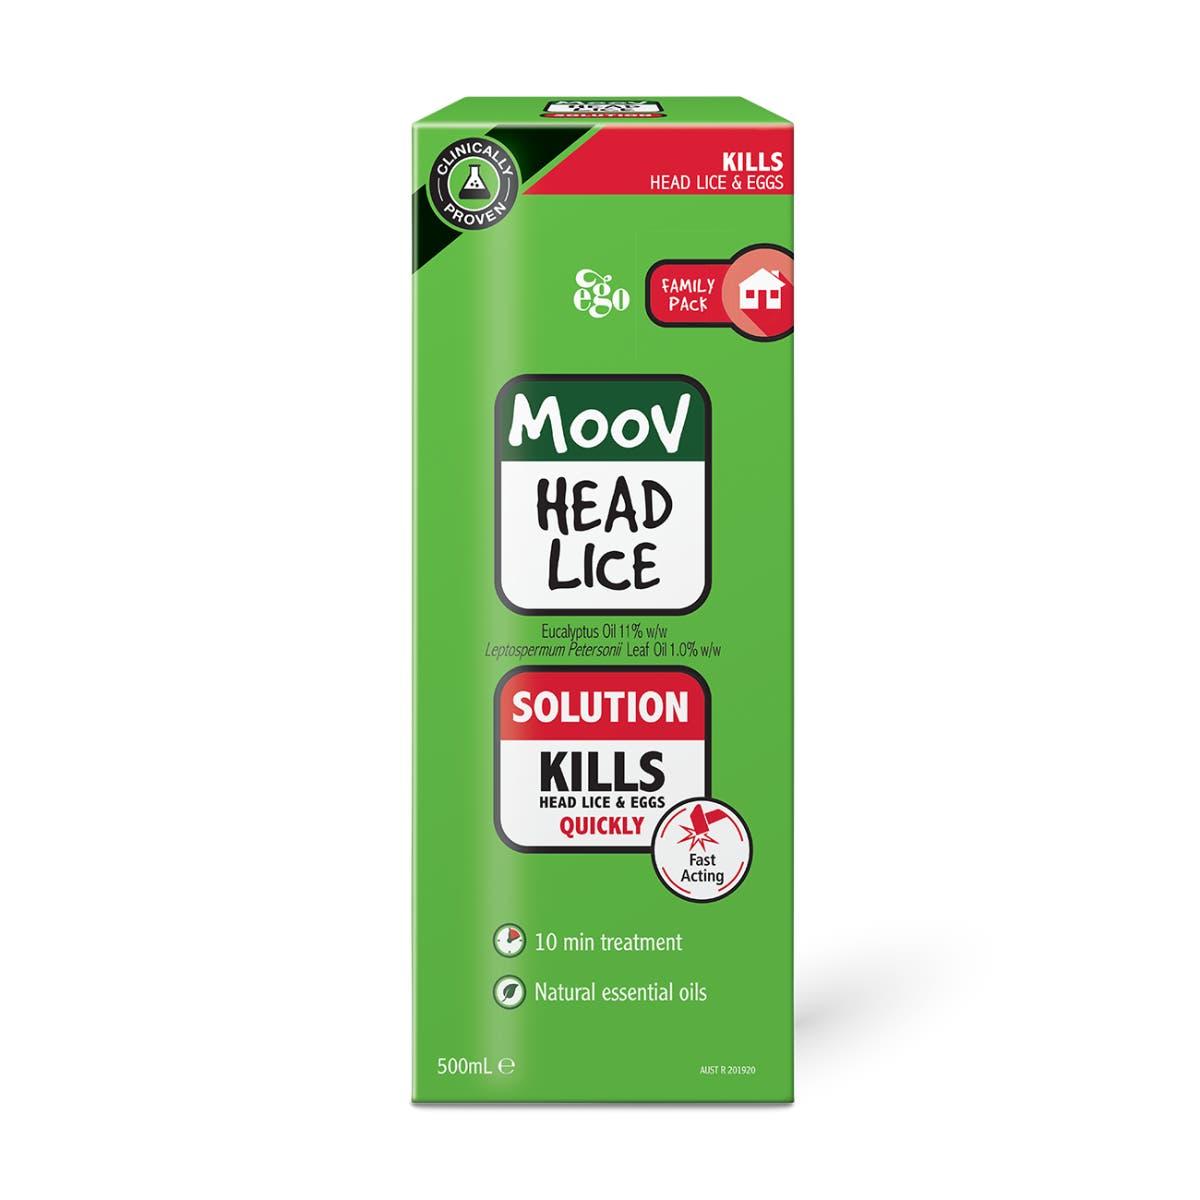 MOOV Head Lice Solution